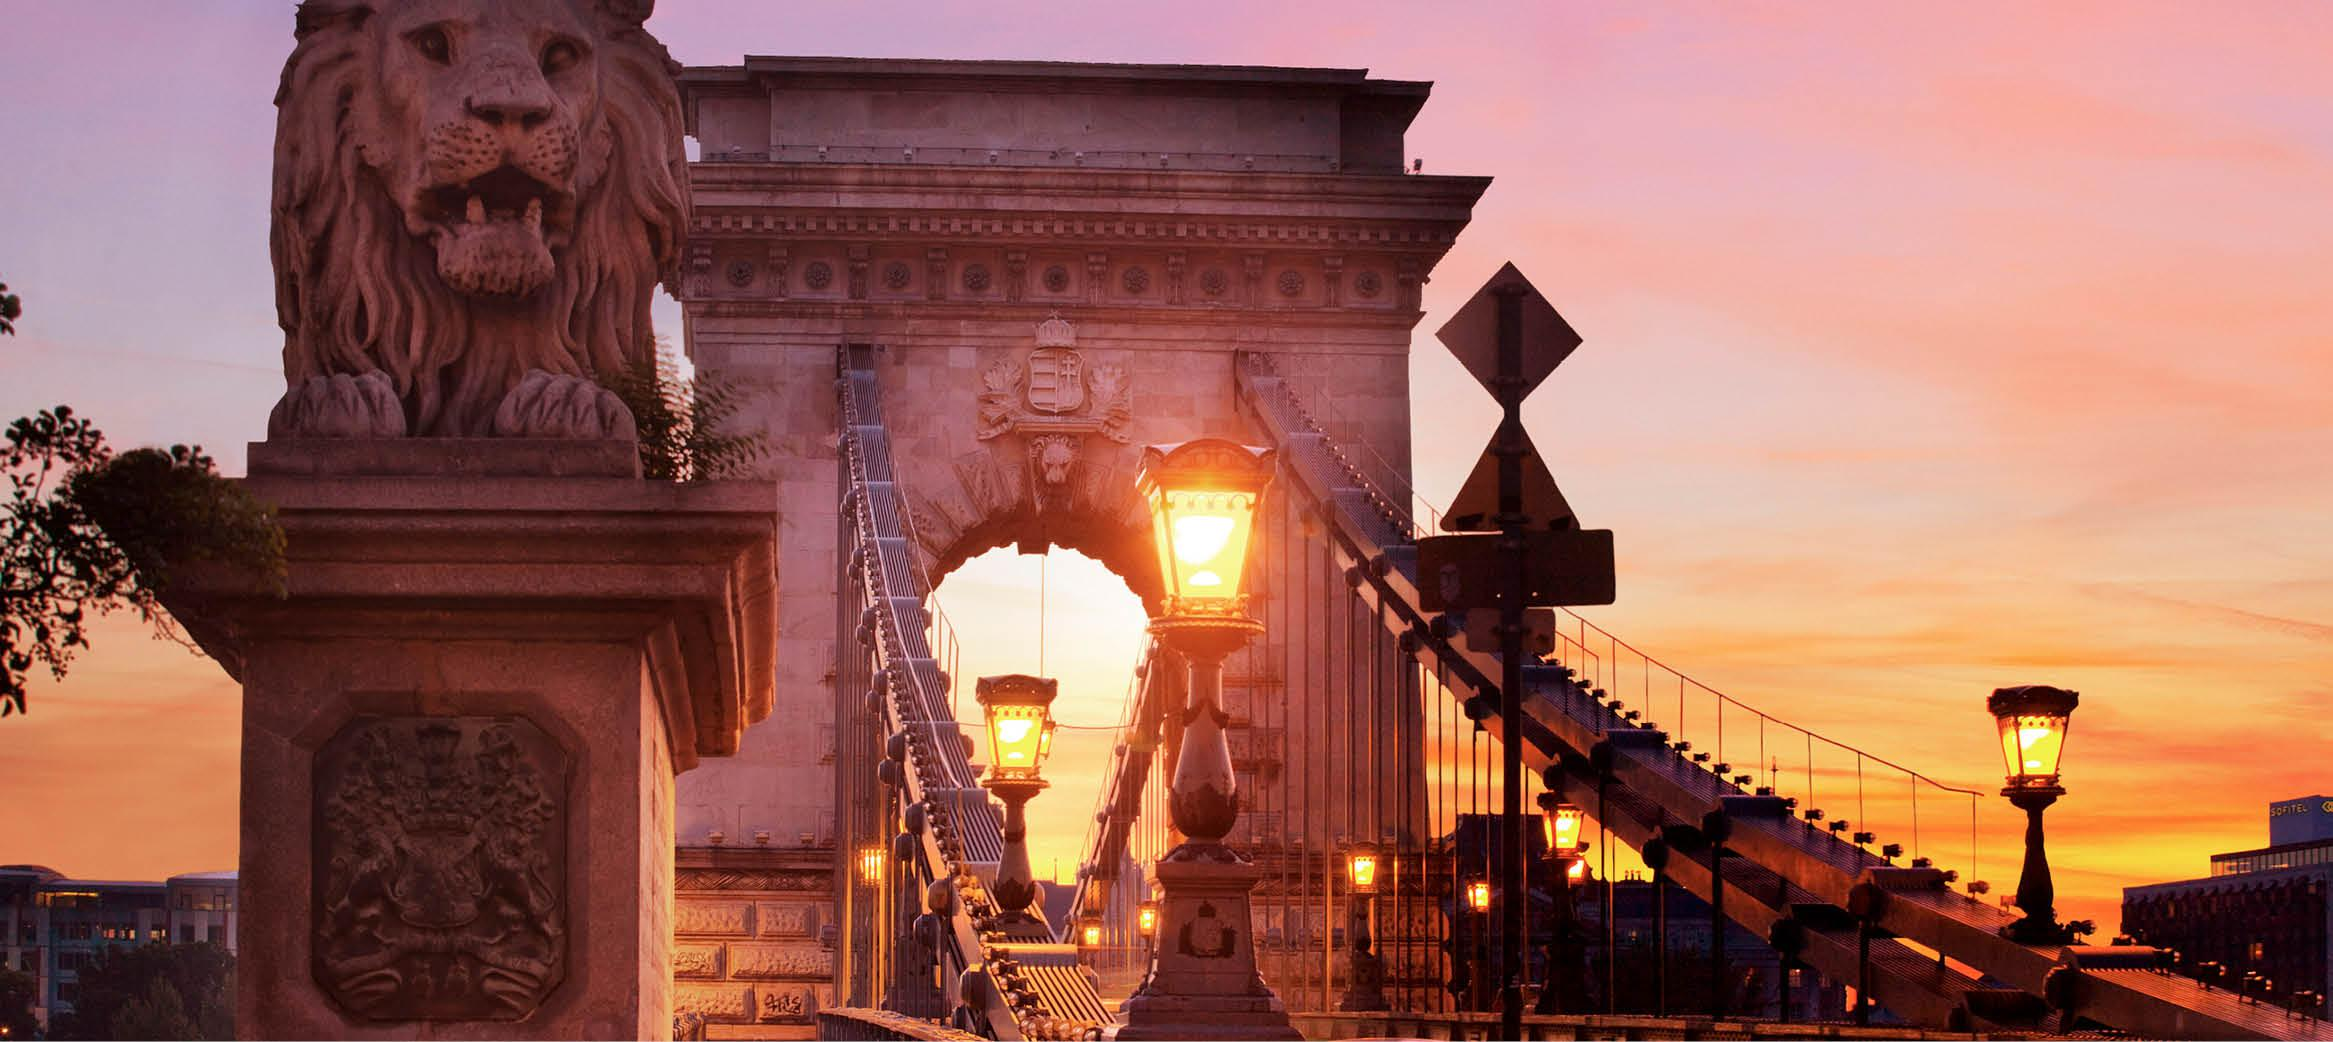 Kædeboen i solnedgang i budapest